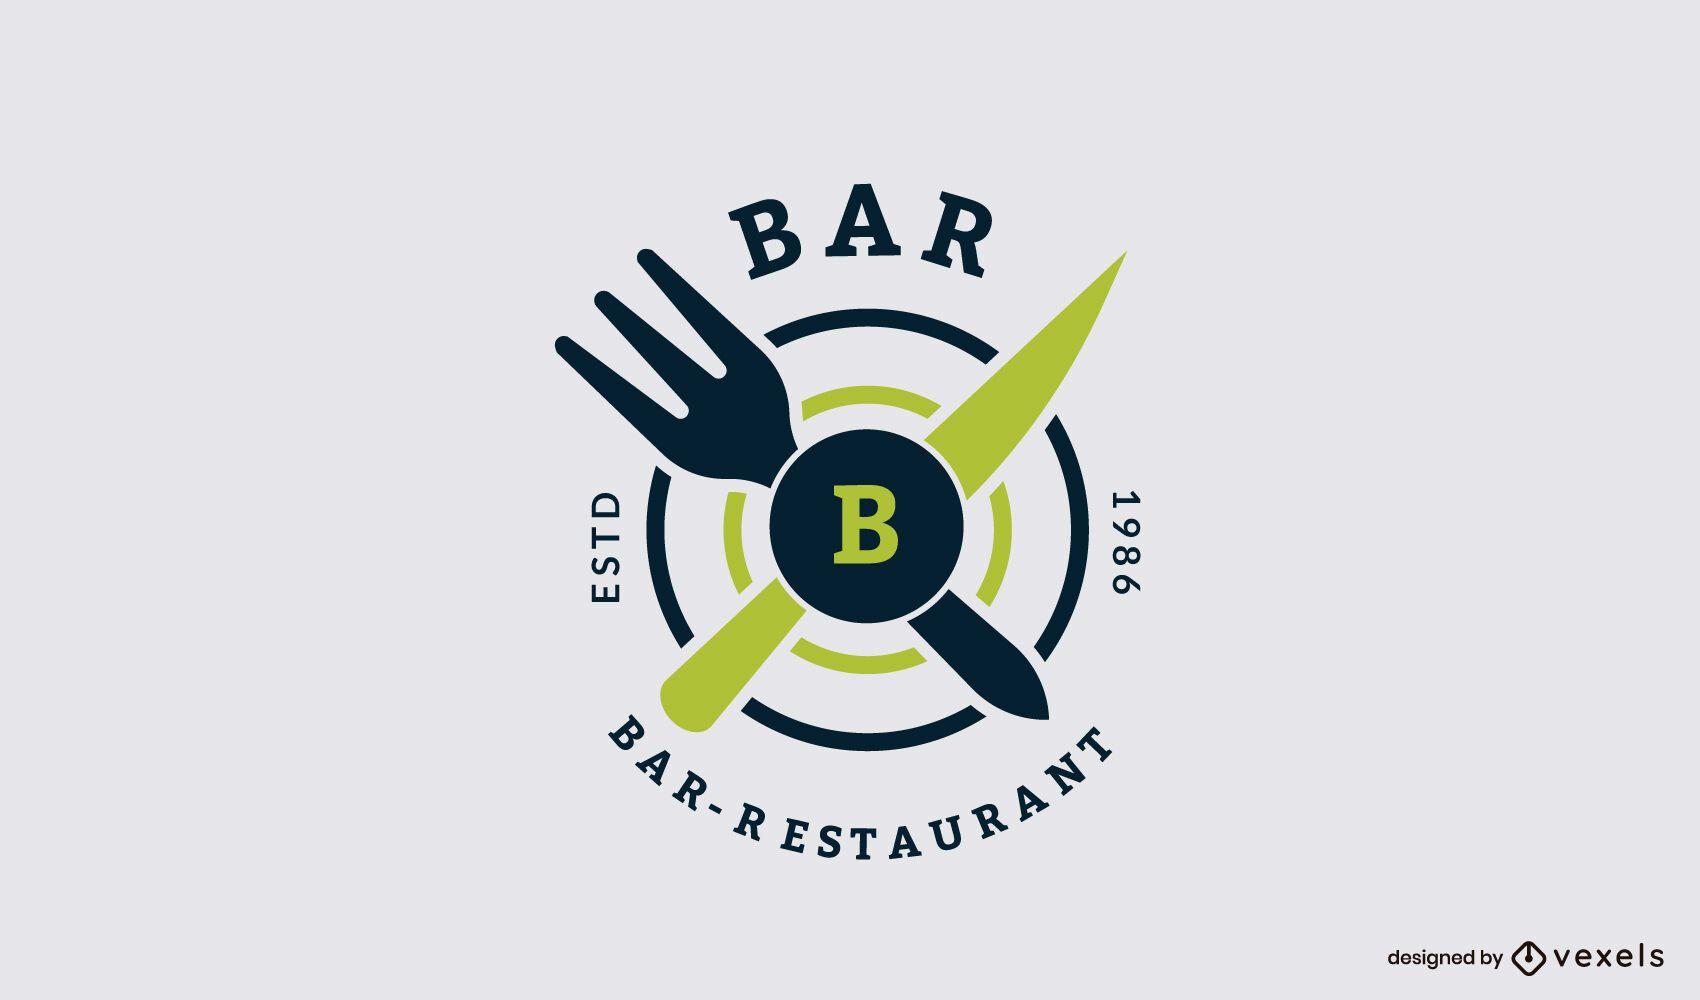 Diseño de logotipo bar restaurante